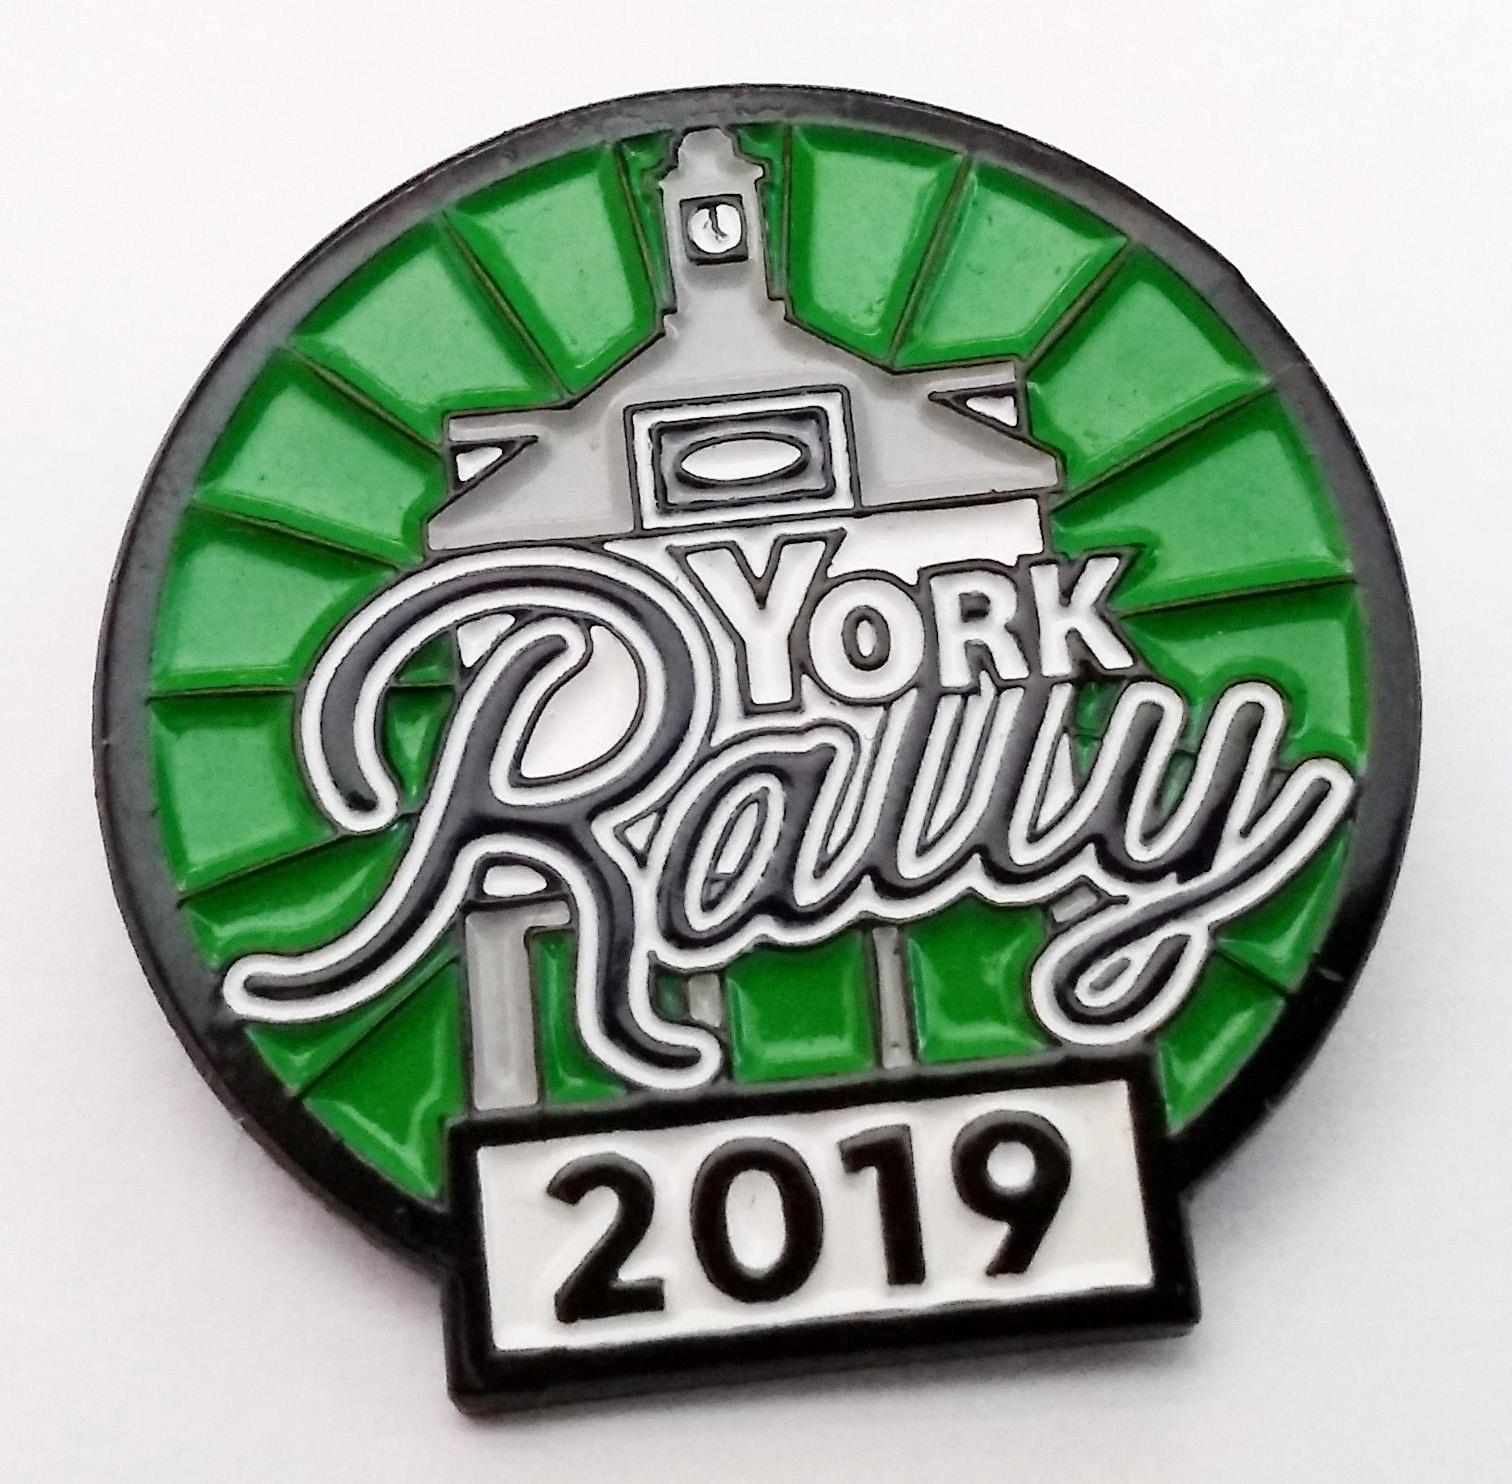 1. 2019 badges